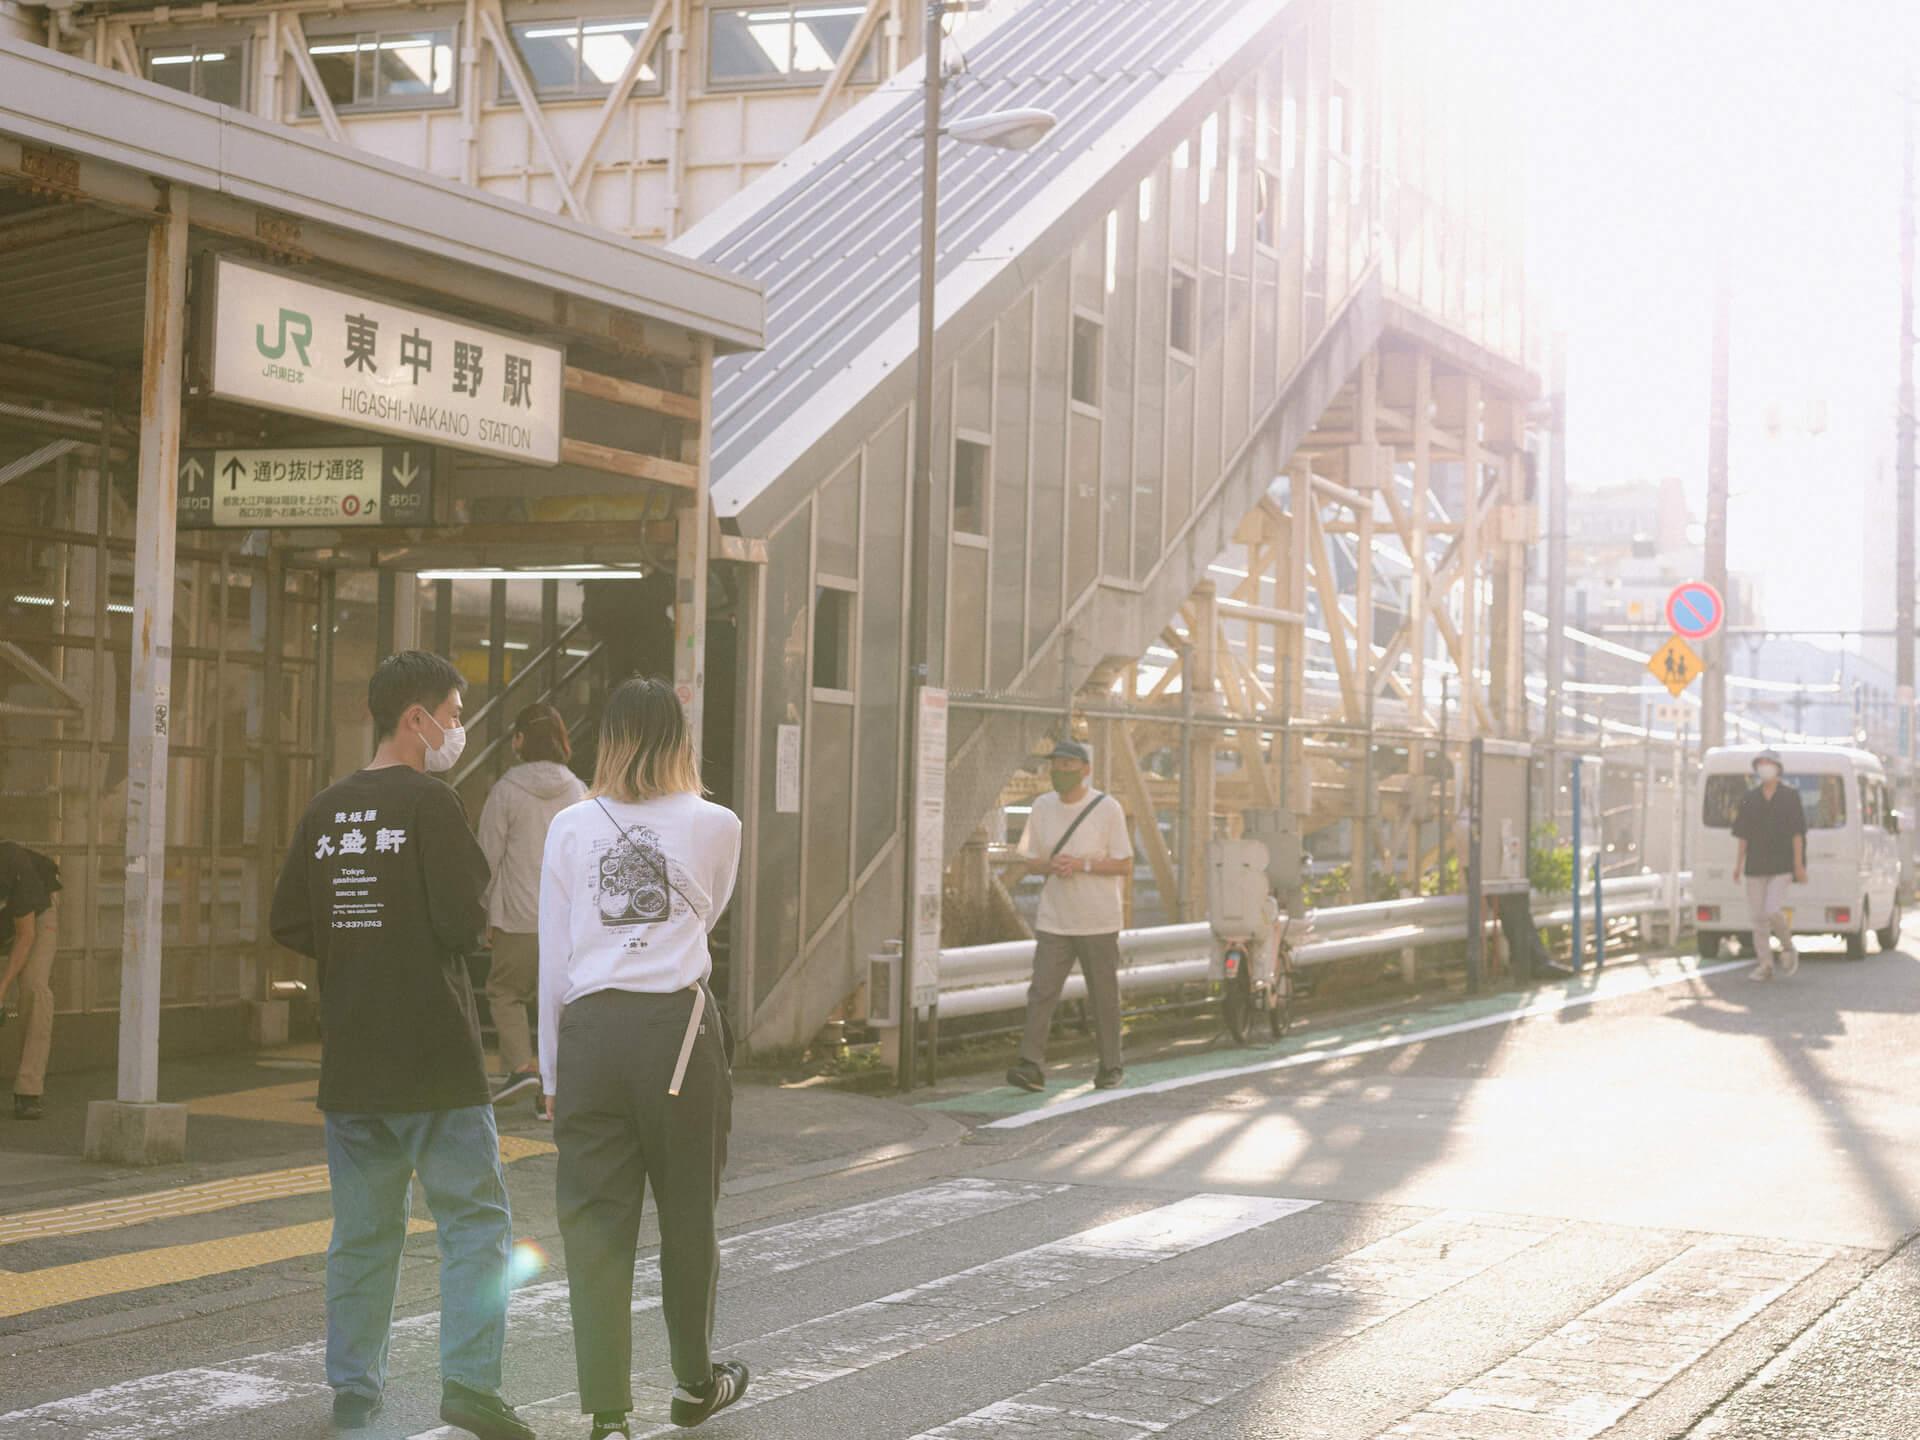 ZEN-LA-ROCKのブランド・NEMESと大盛軒のコラボ第2弾がリリース|ポップアップで10月8日(鉄板麺の日)を祝したグッズを先行発売 life-fashion211004-nemes-ohmoriken-6